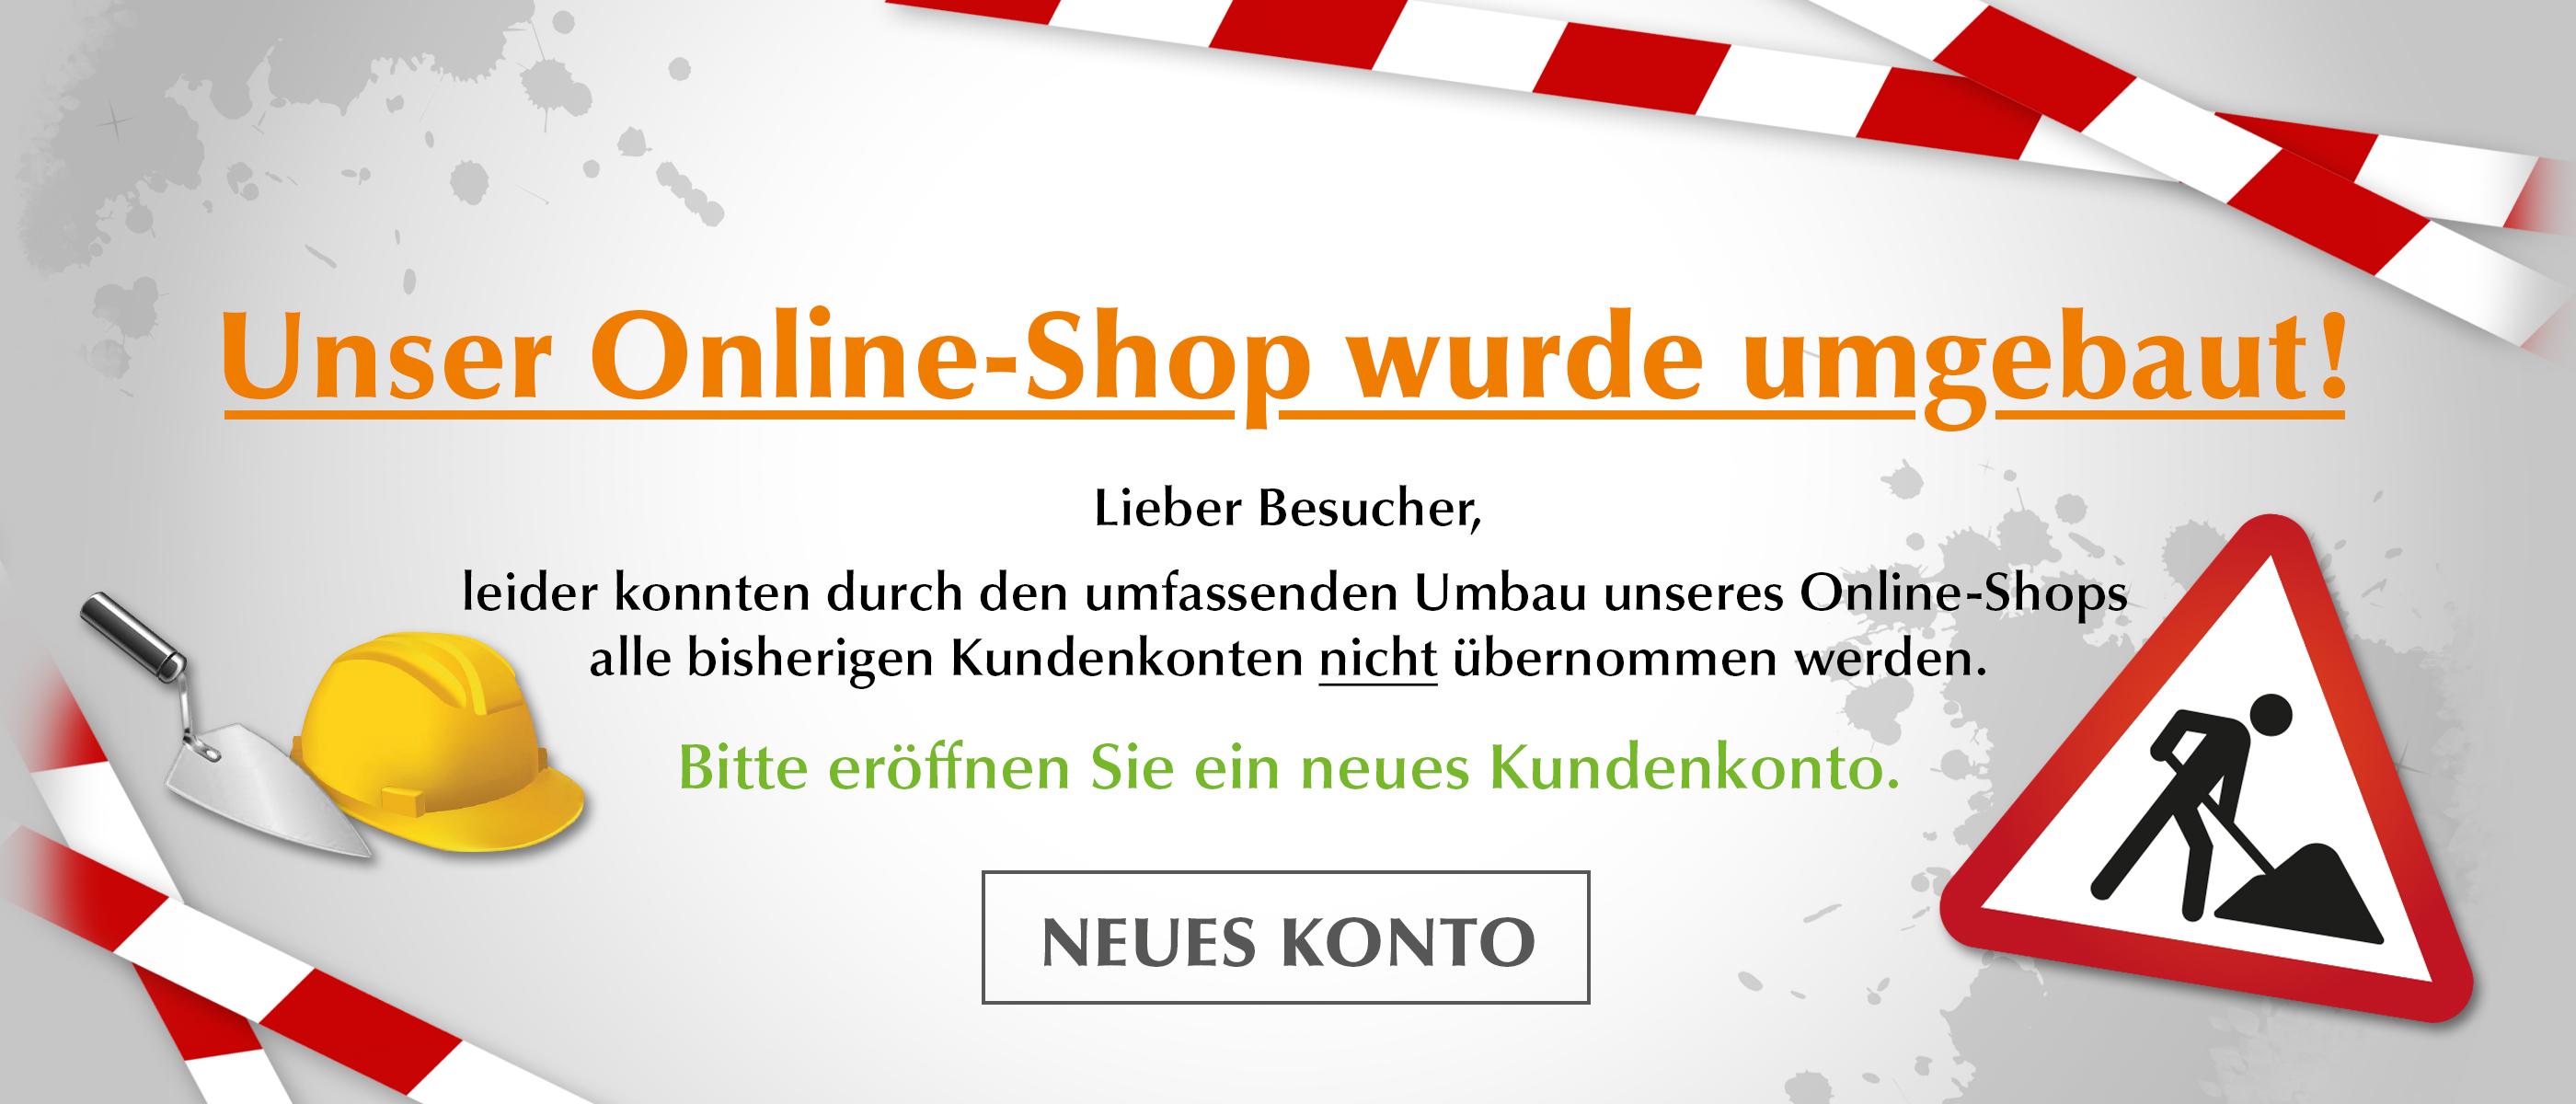 Hinweis: Unser Online-Shop wurde umgebaut!